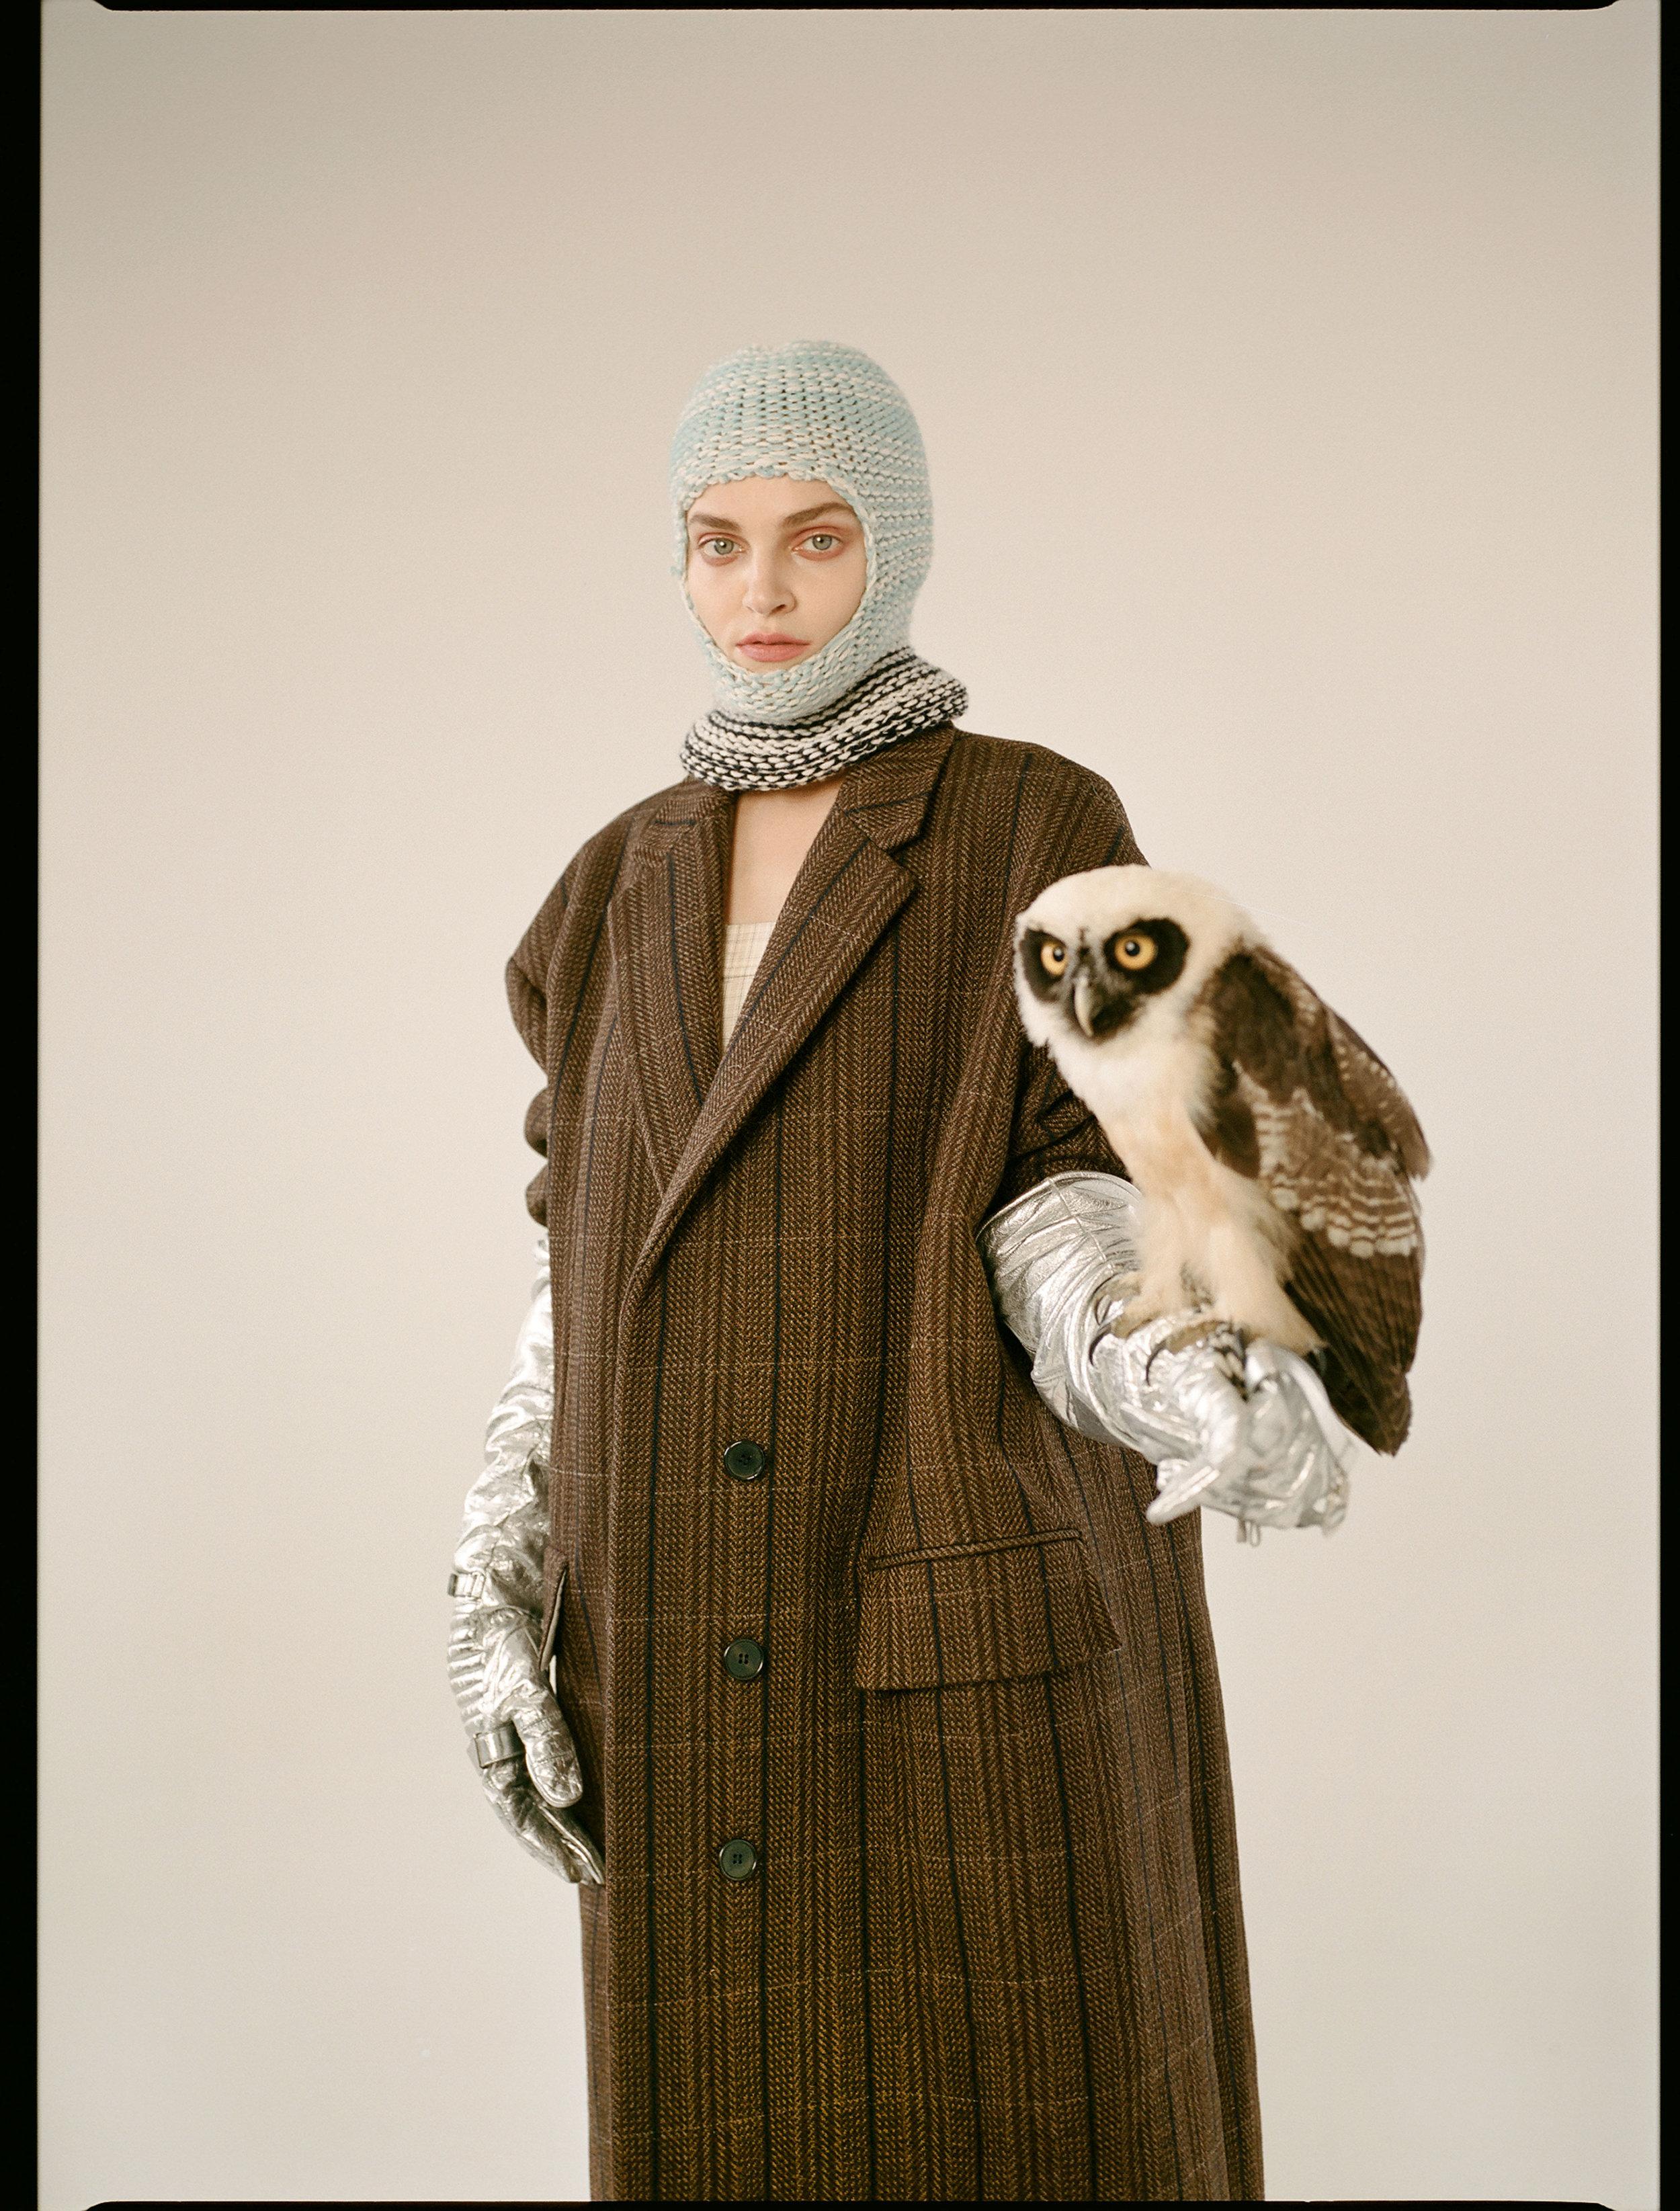 CALVIN KLEIN   205W39NYC   jacket, gloves and balaclava.